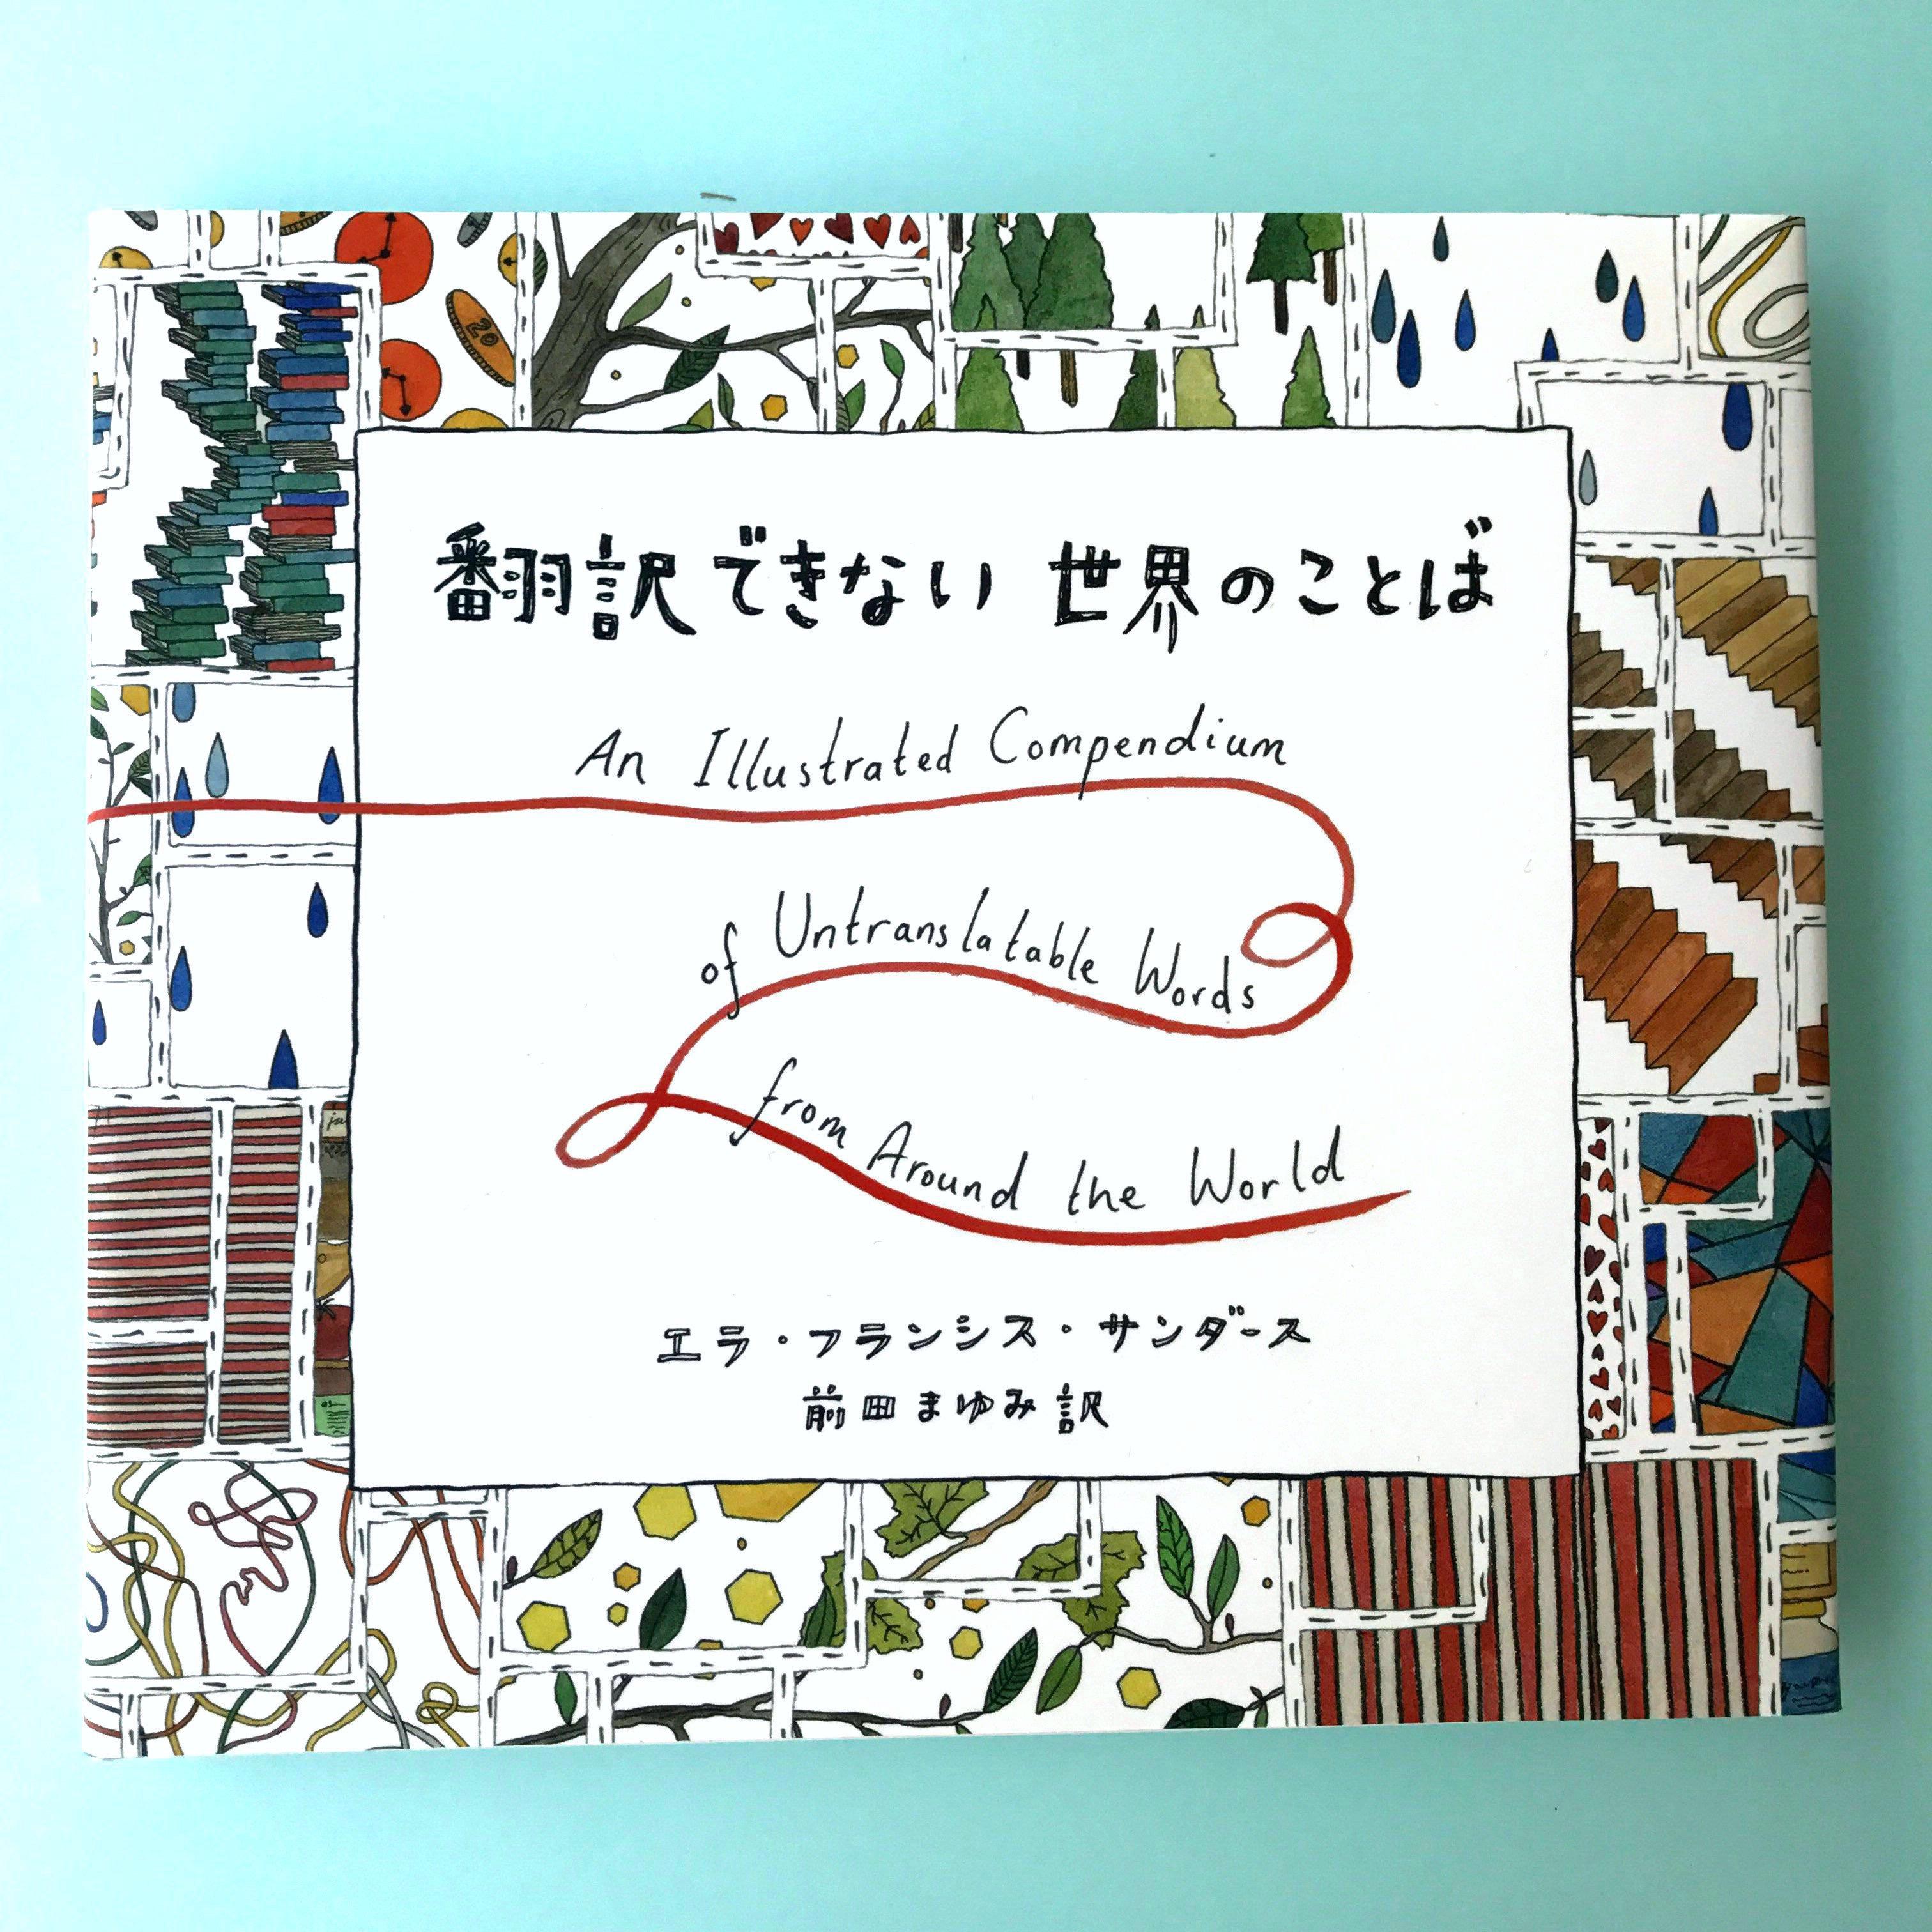 901f3112214d 様々な言語のニッチな単語を集めたこの本には、「イクトゥアルポク」の他にも聞いたこともない言葉が満載。タガログ語の「キリグ」(おなかの中に蝶が舞っている気分。